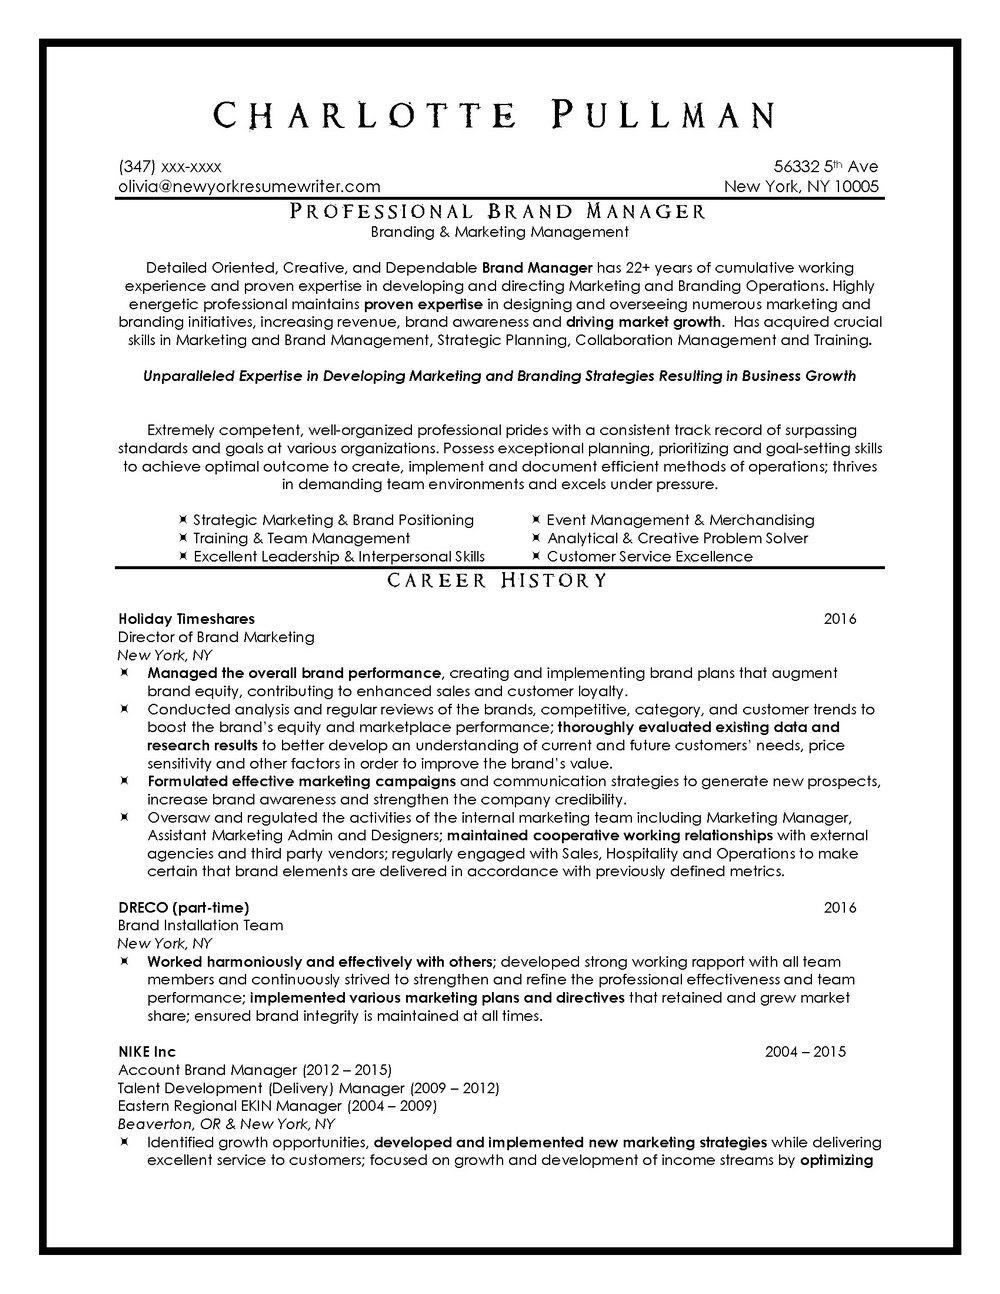 Professional Resume Writing Services Toronto